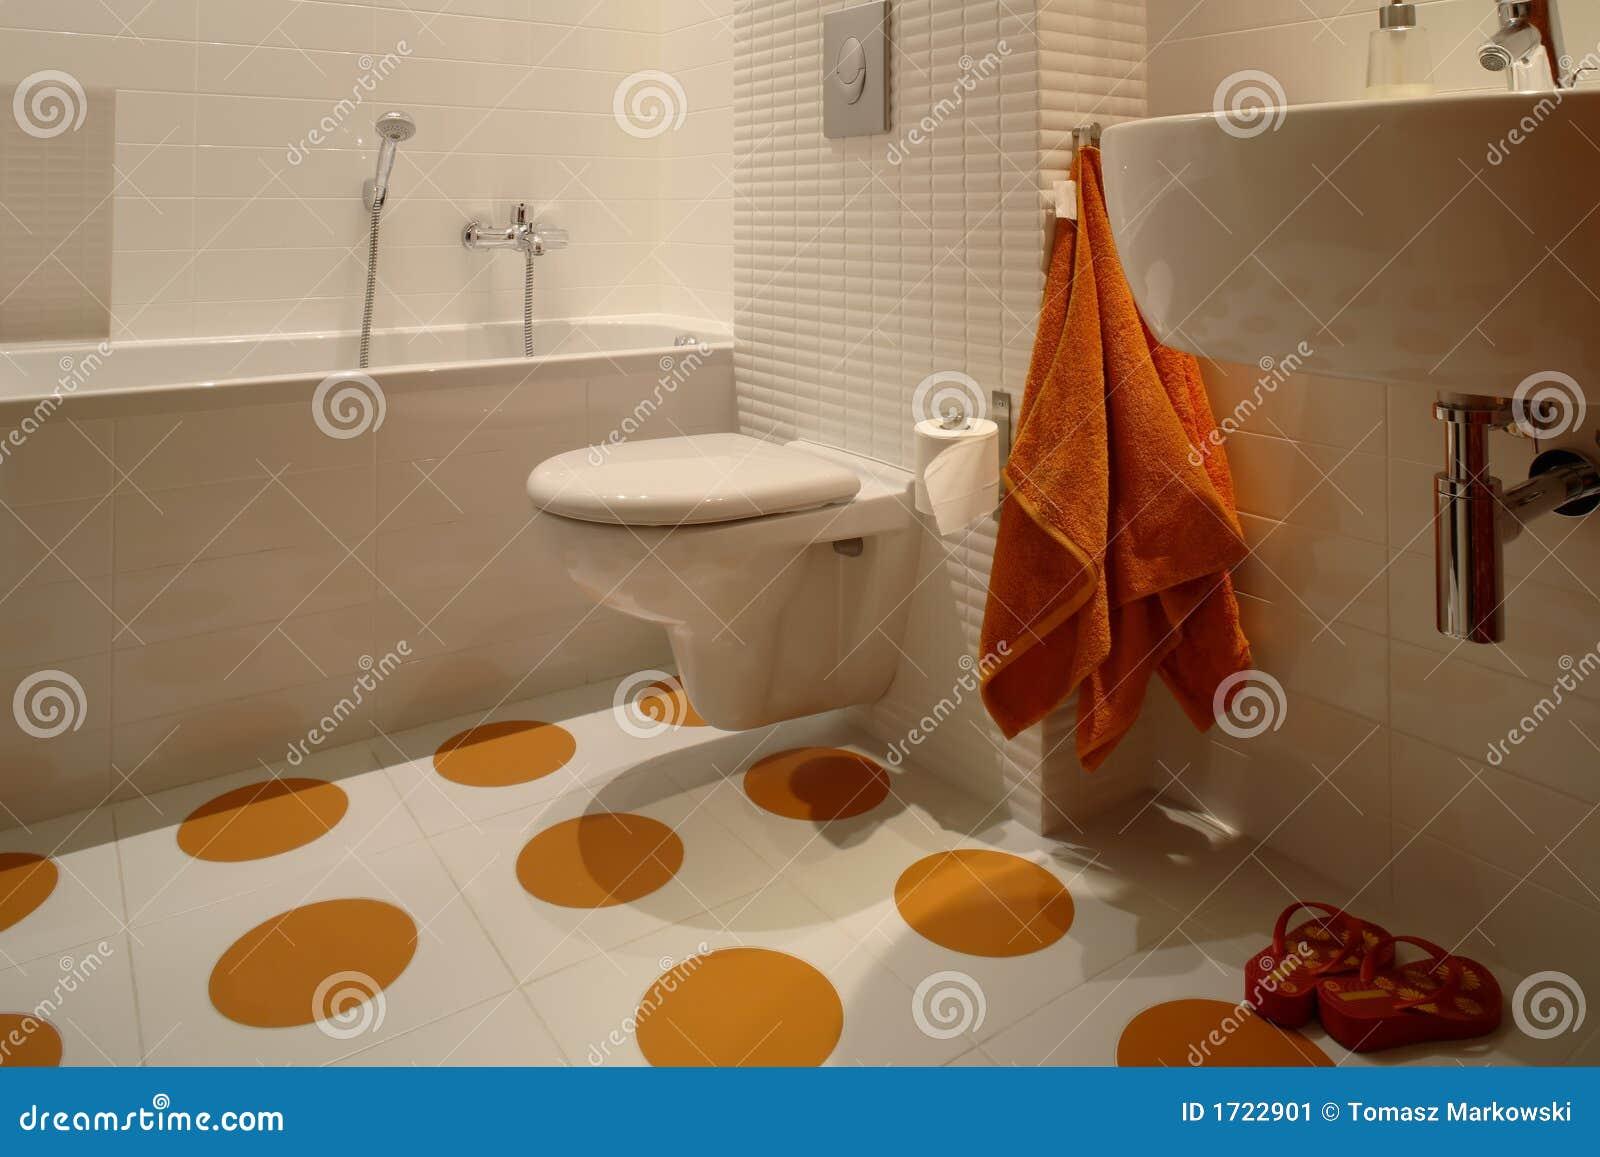 Modern Bathroom For Kids Stock Image Image Of Circle